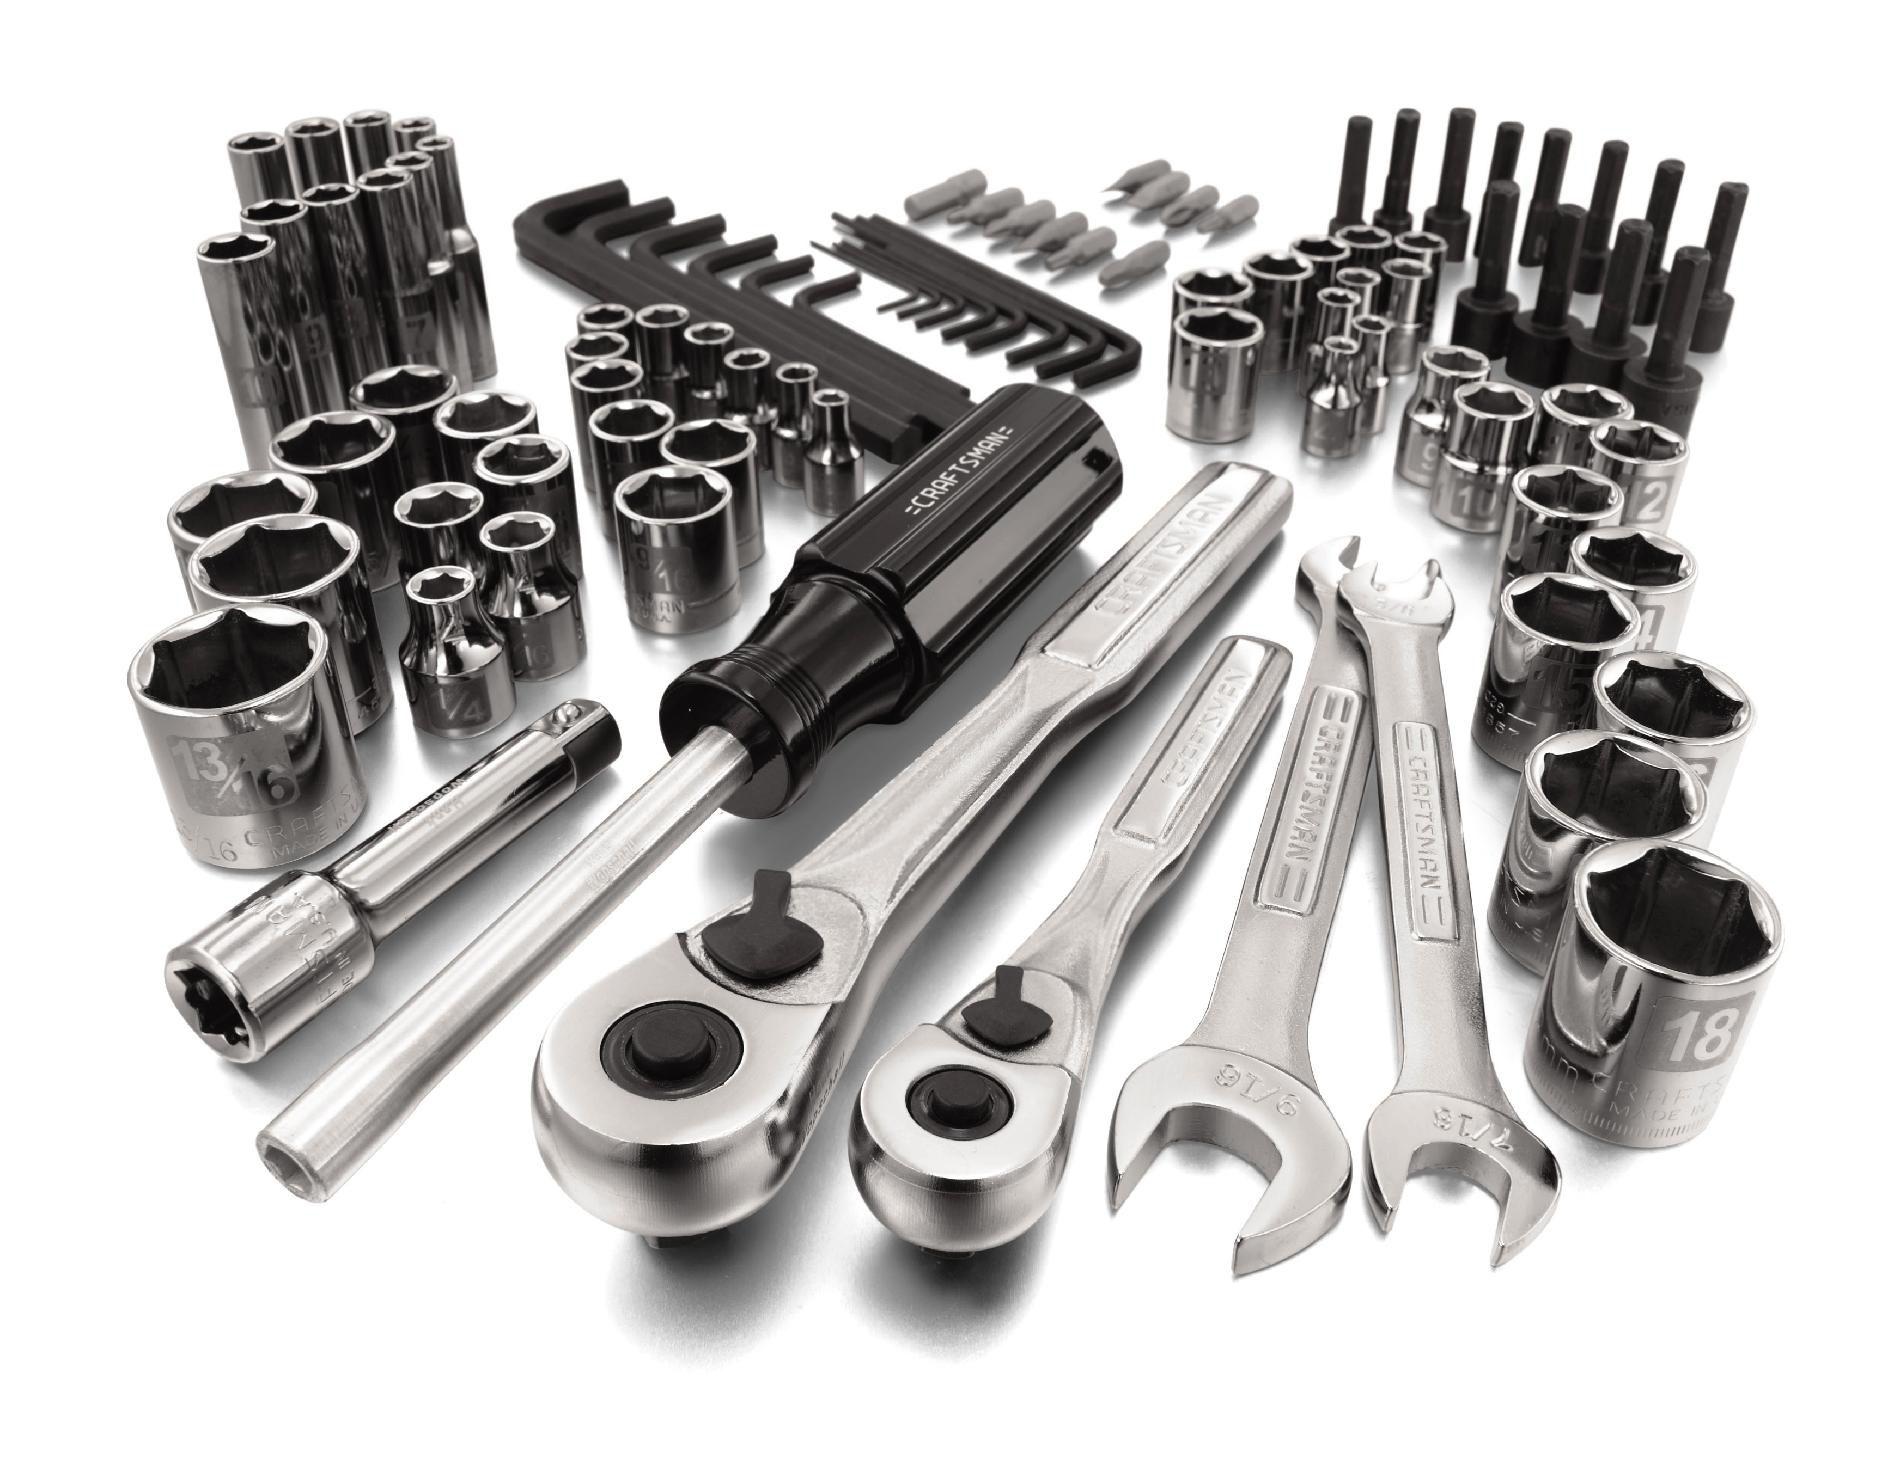 Craftsman 94 pc. Easy-To-Read Mechanics Tool Set